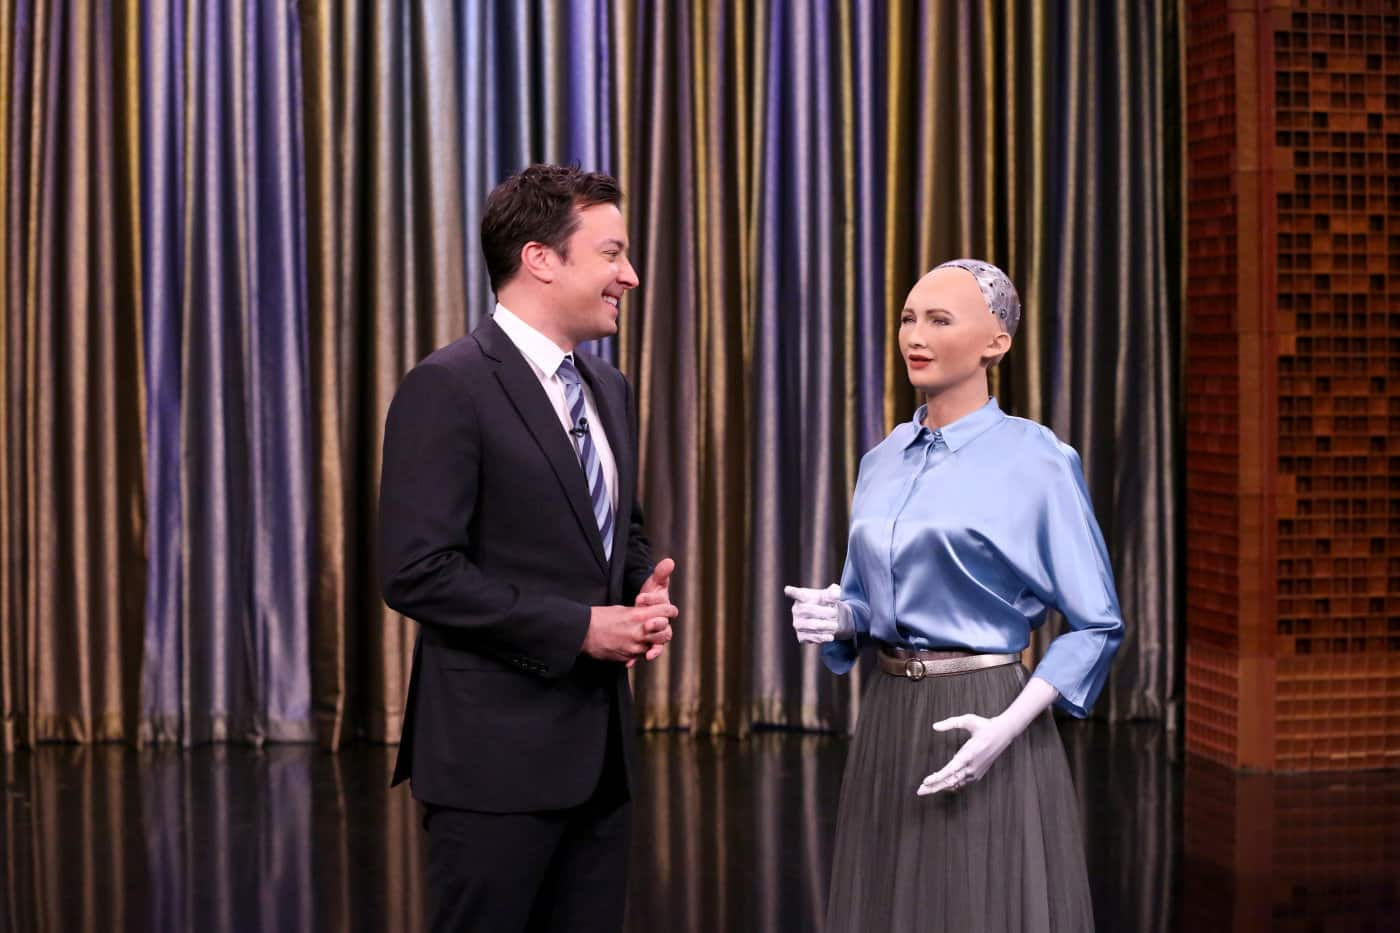 Sophia social humanoid robot